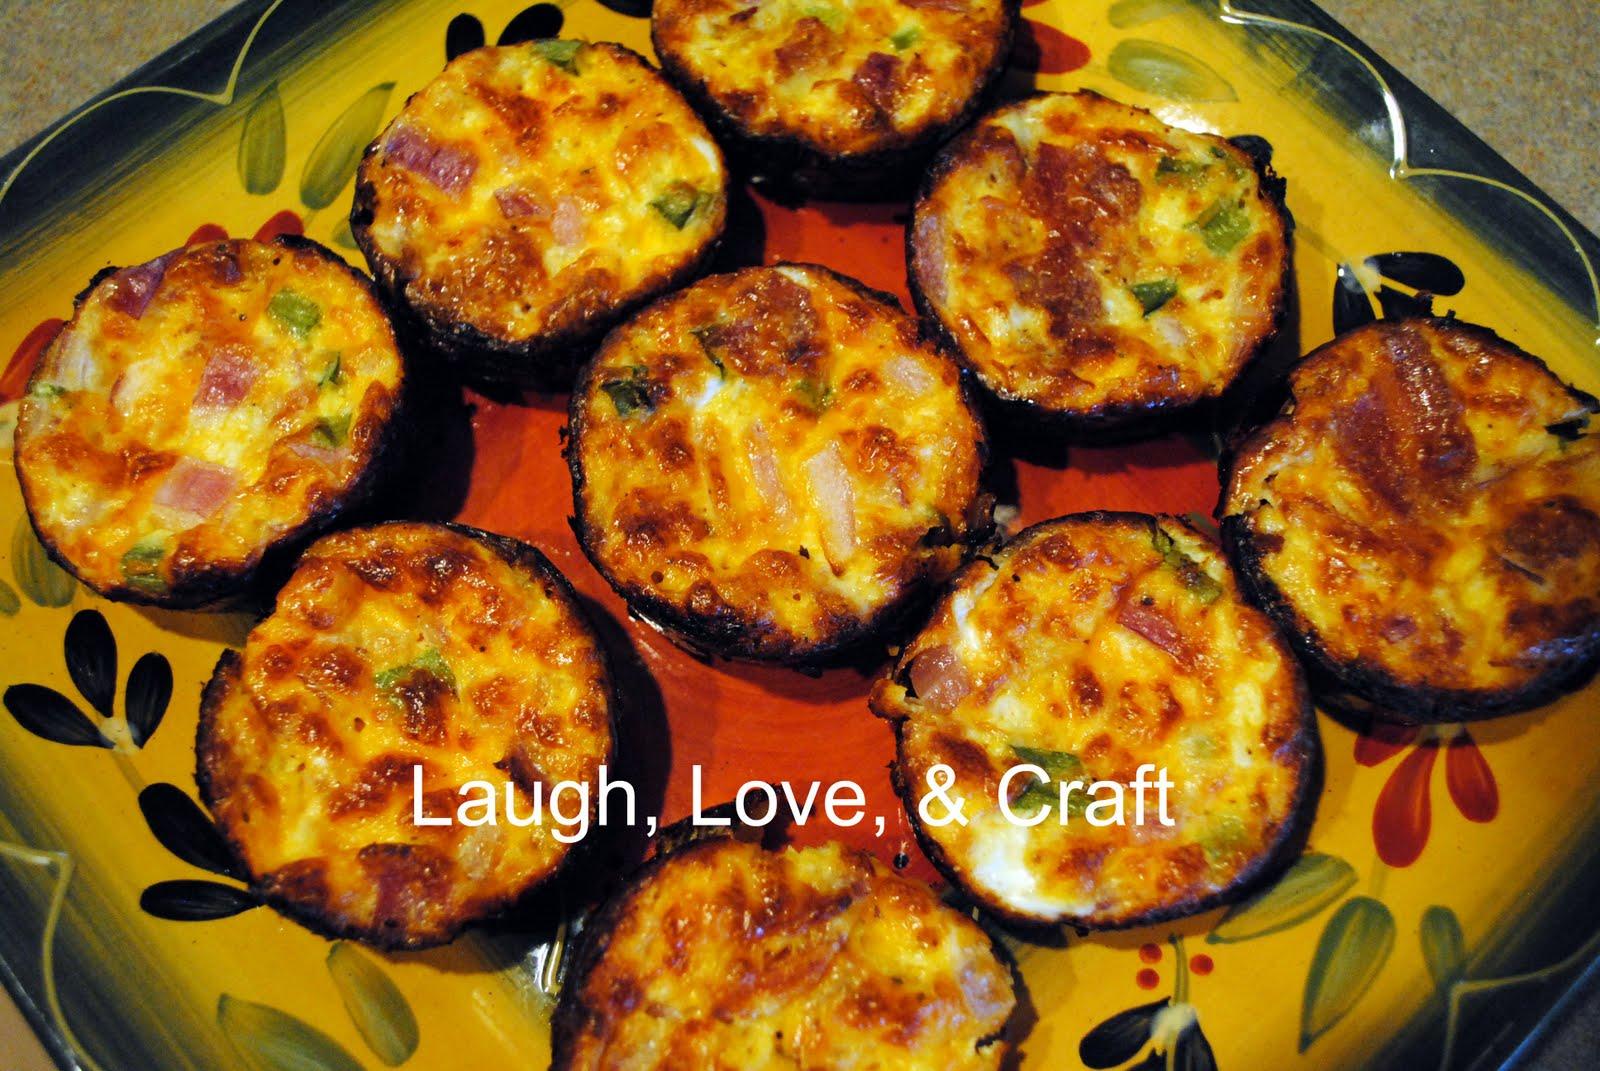 Laugh, Love, and Craft: Crustless Quiche Muffins